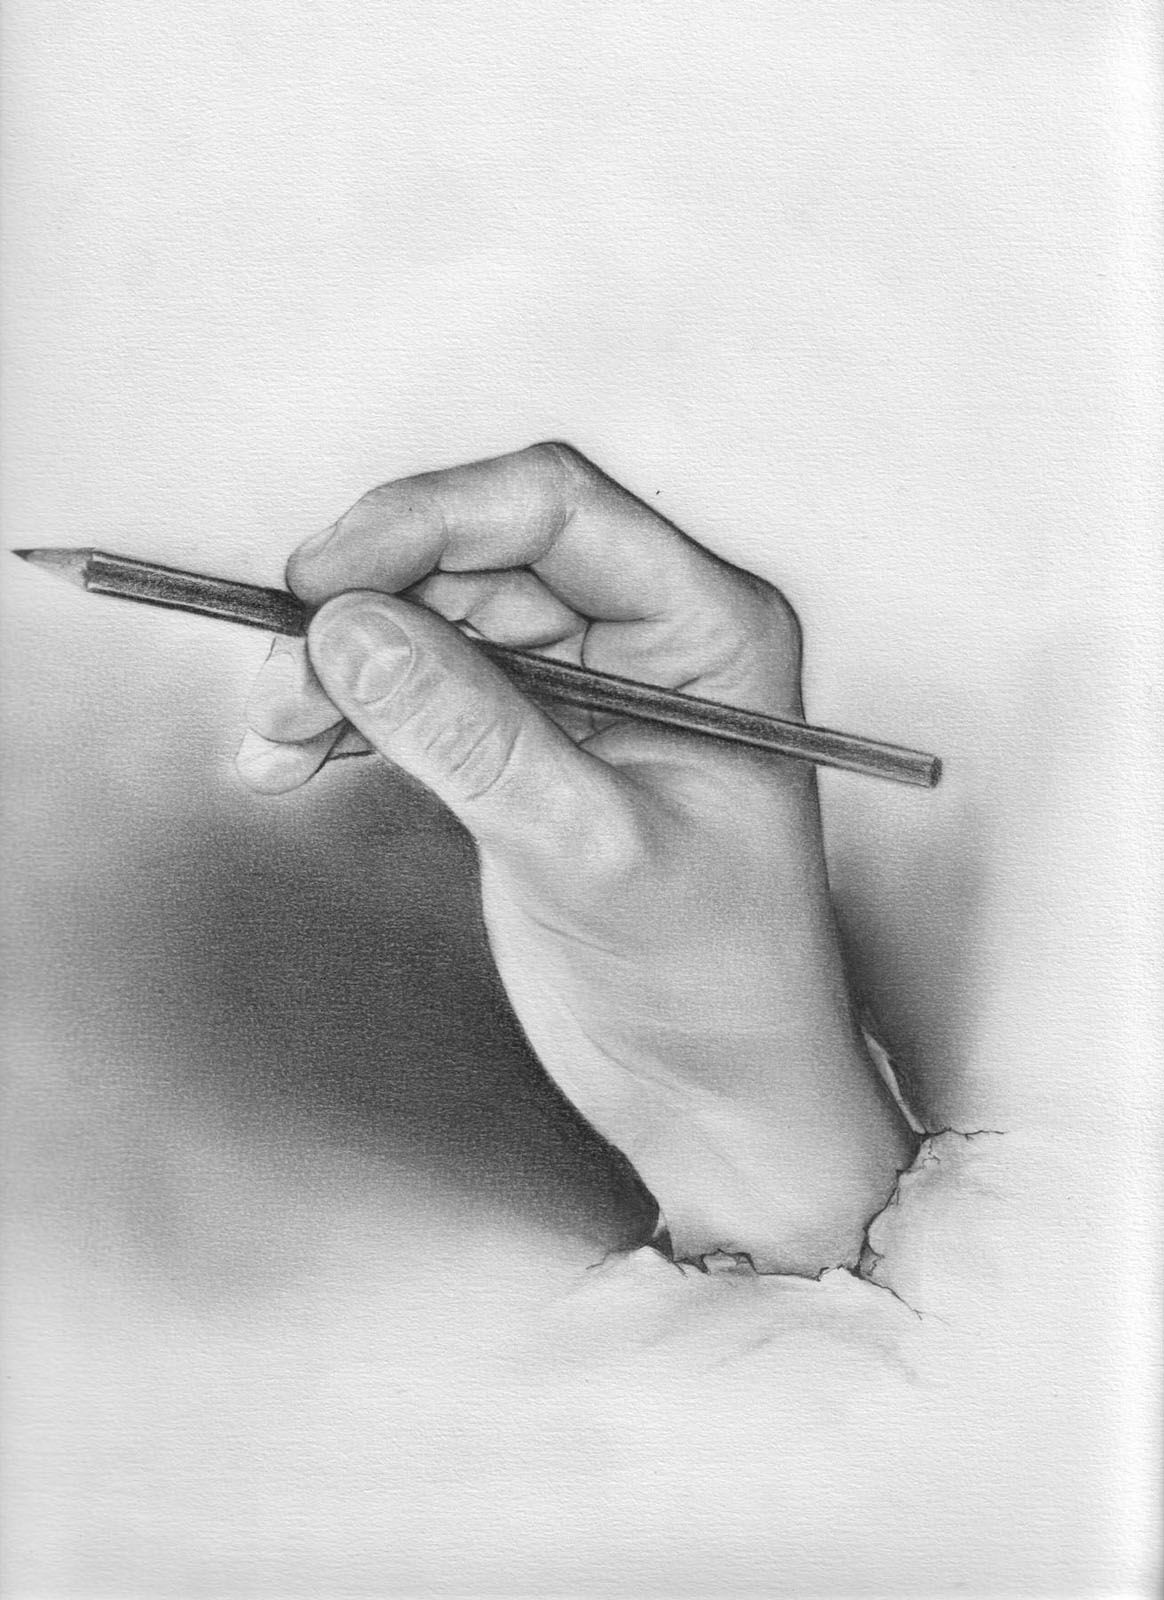 Ma main main dessin crayon drawing portrait dessin à la main peinture stefouine